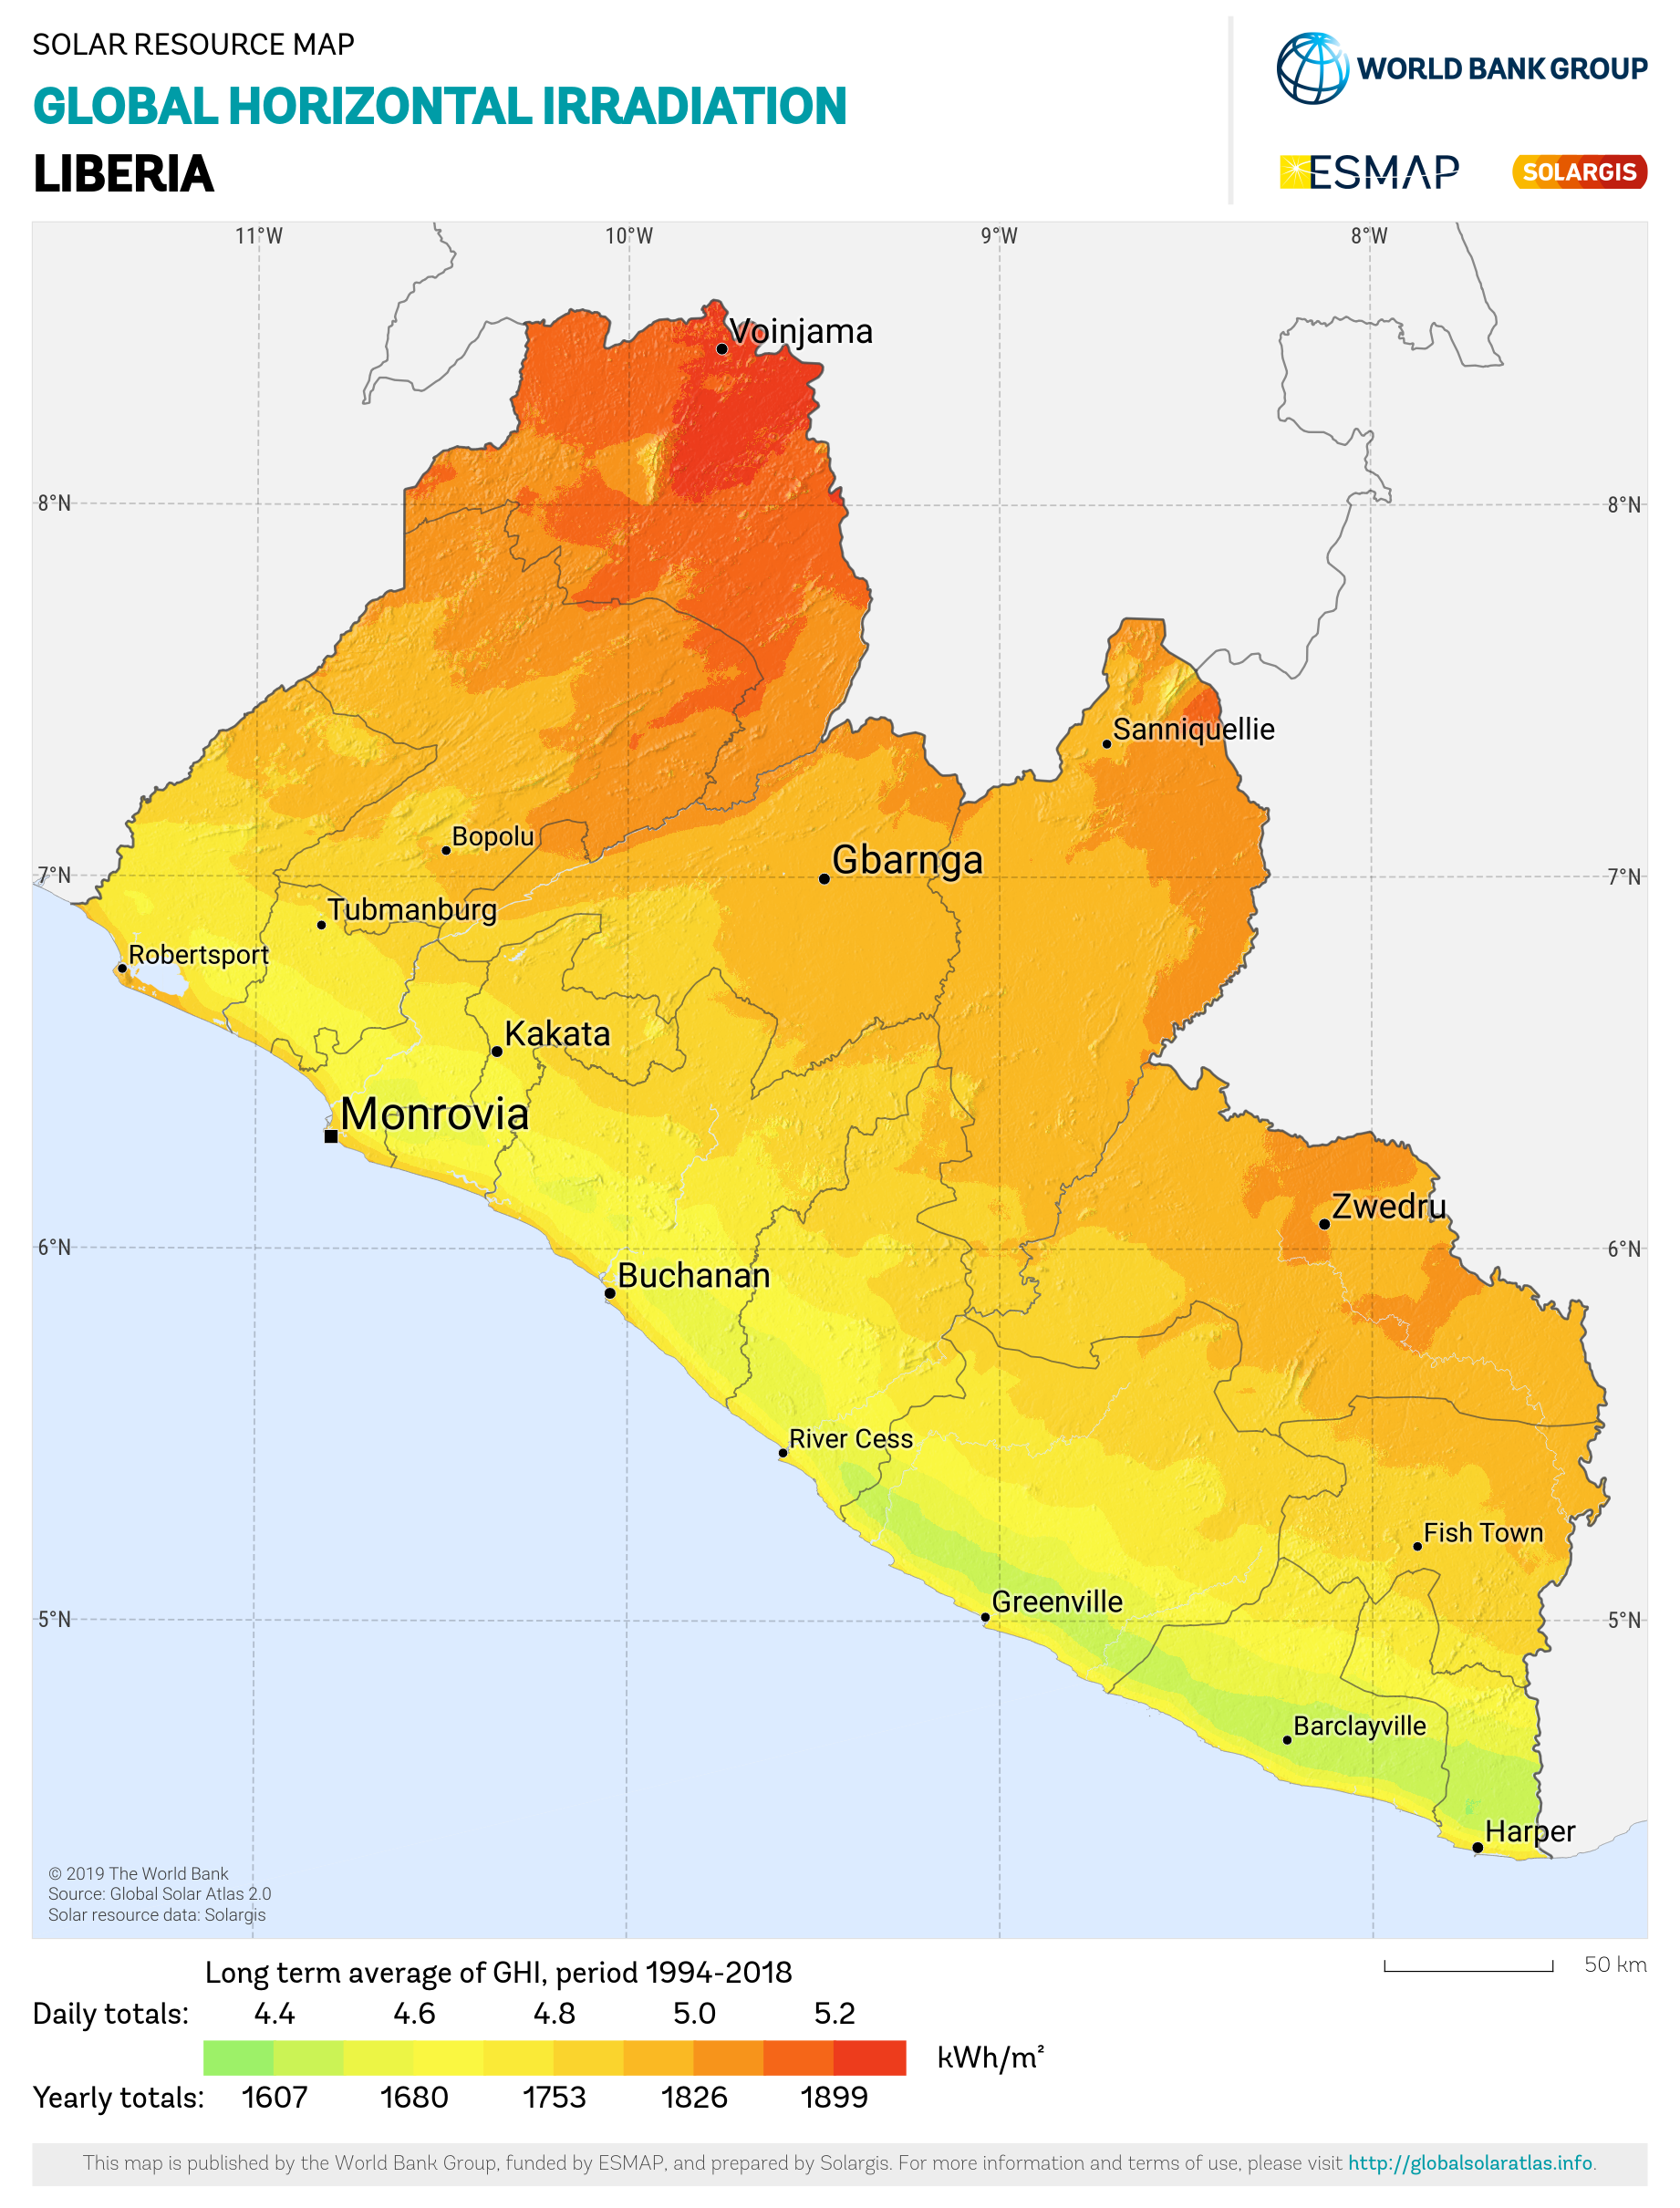 SOLARGIS_GHI Liberia_PVOUT KWH per m2